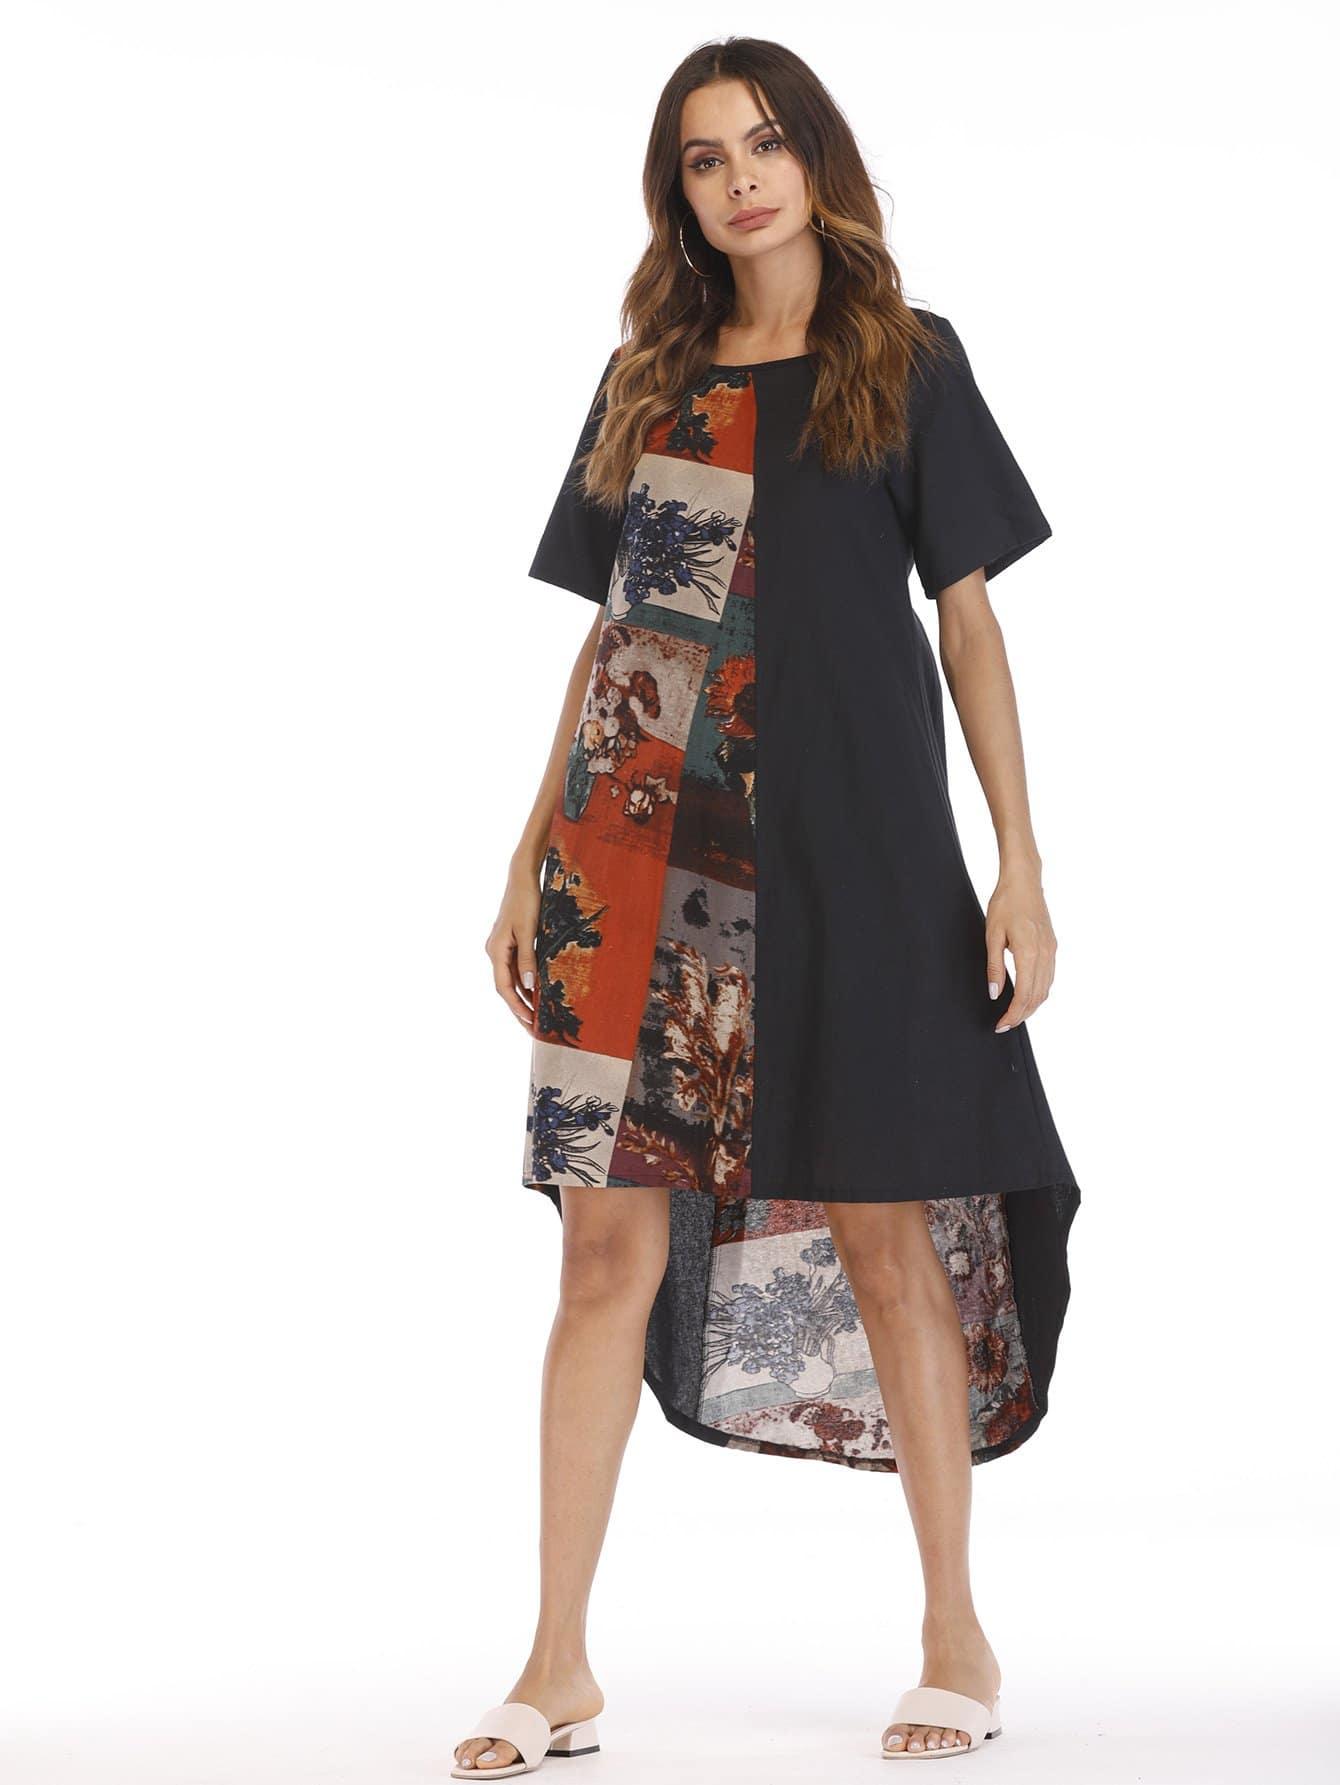 Floral Print High Low Dress emoji print high low night dress